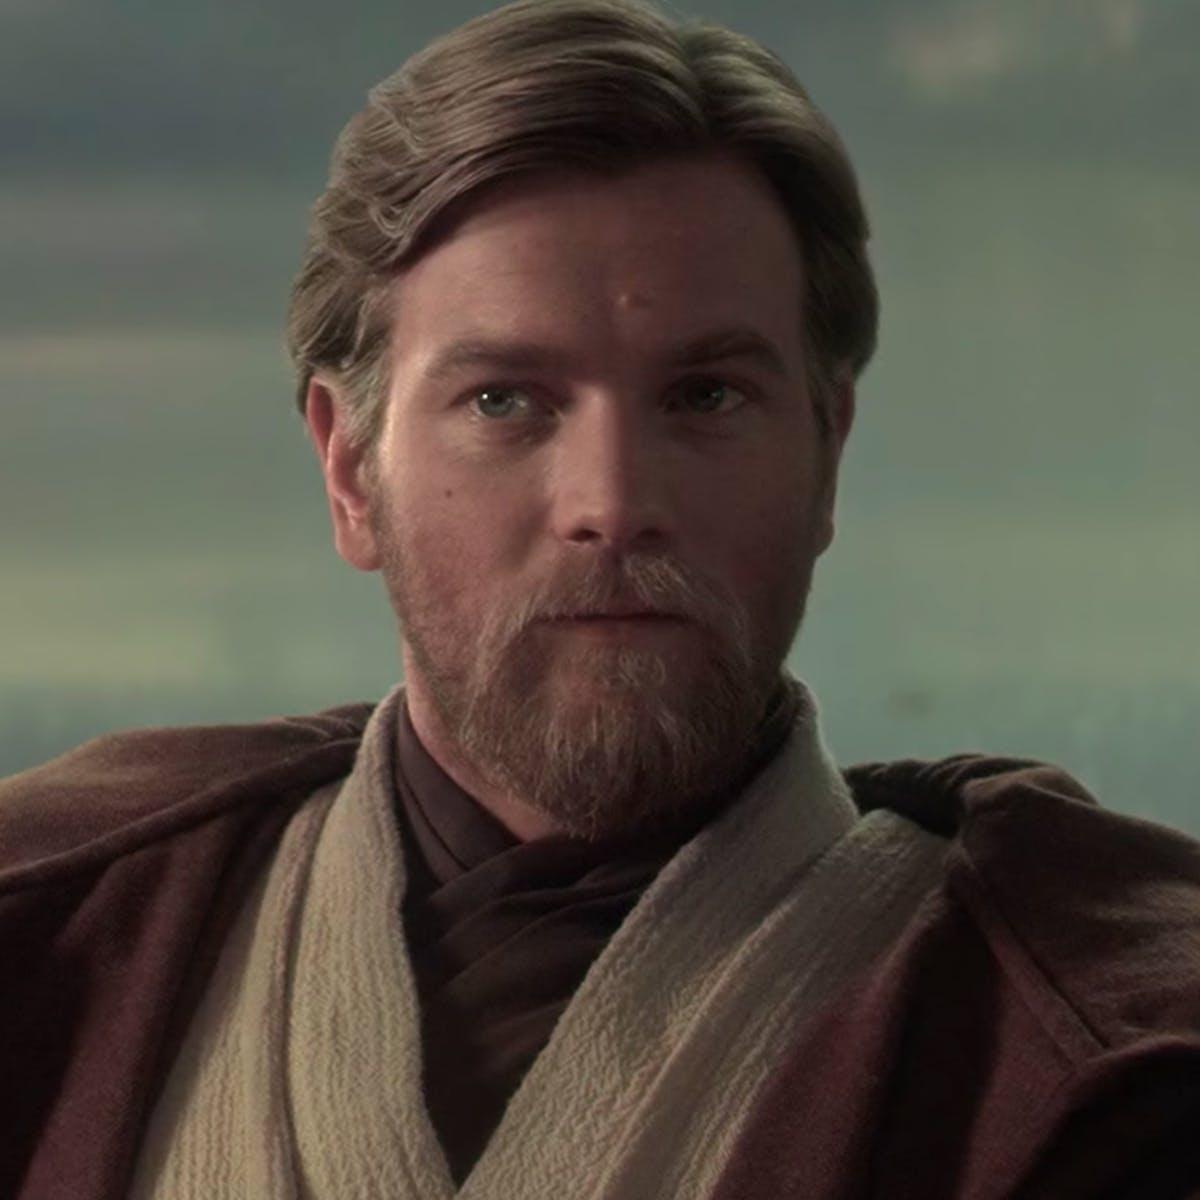 Obi-Wan Kenobi series leak: A classic Star Wars character may return